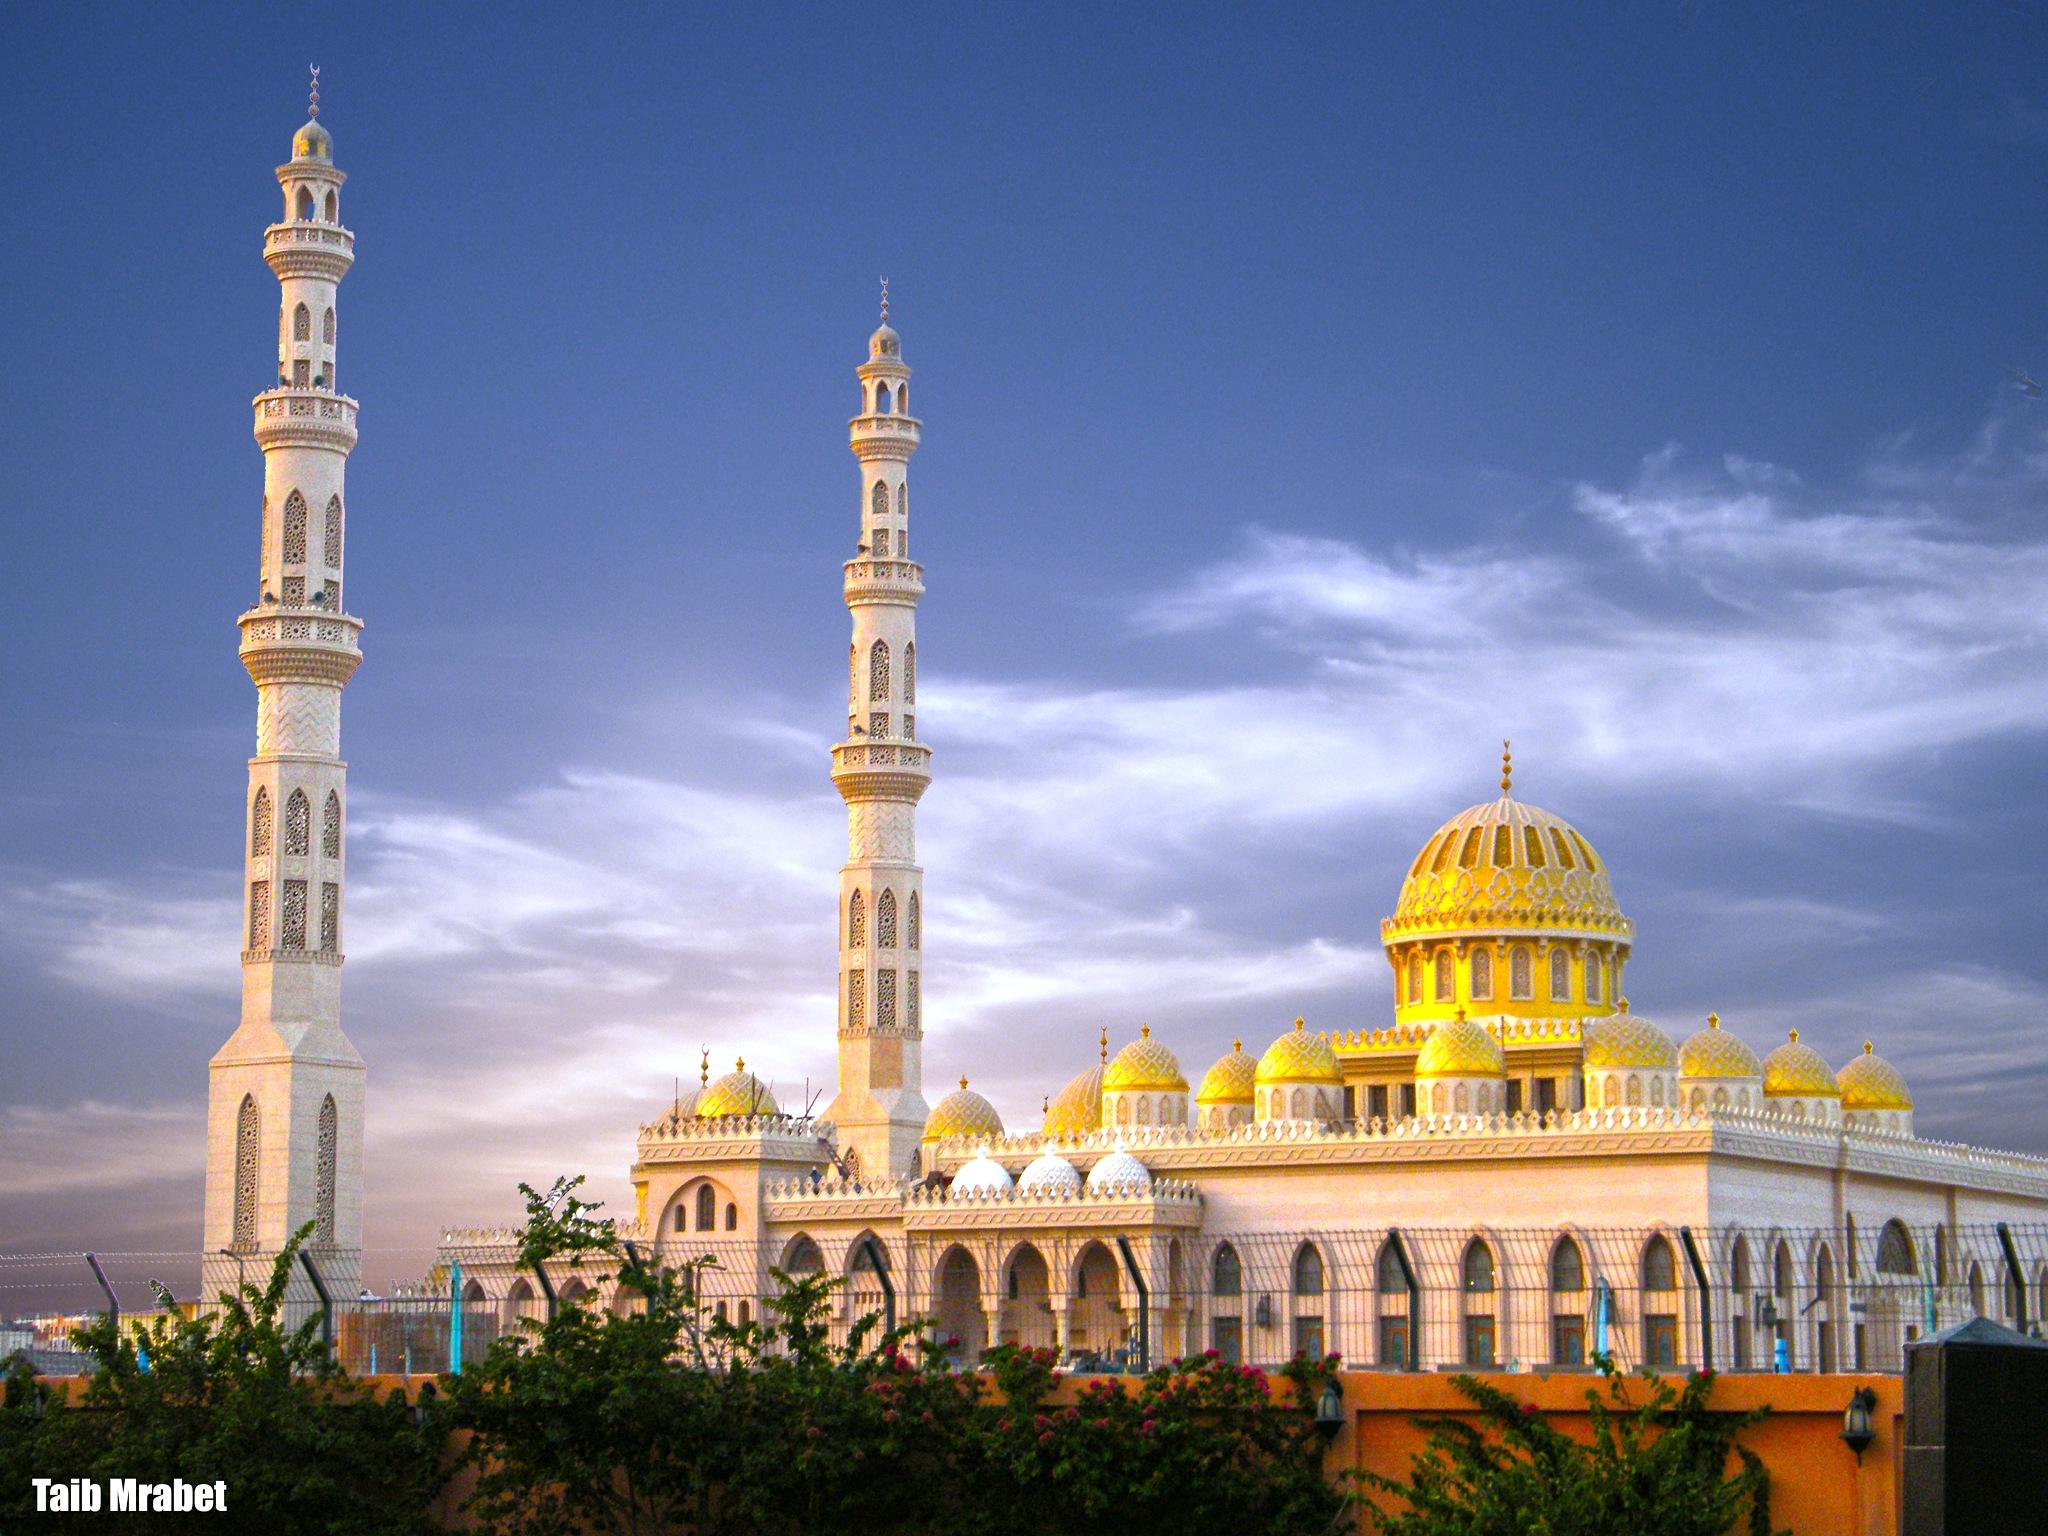 golden mosque by Taib MMrabet